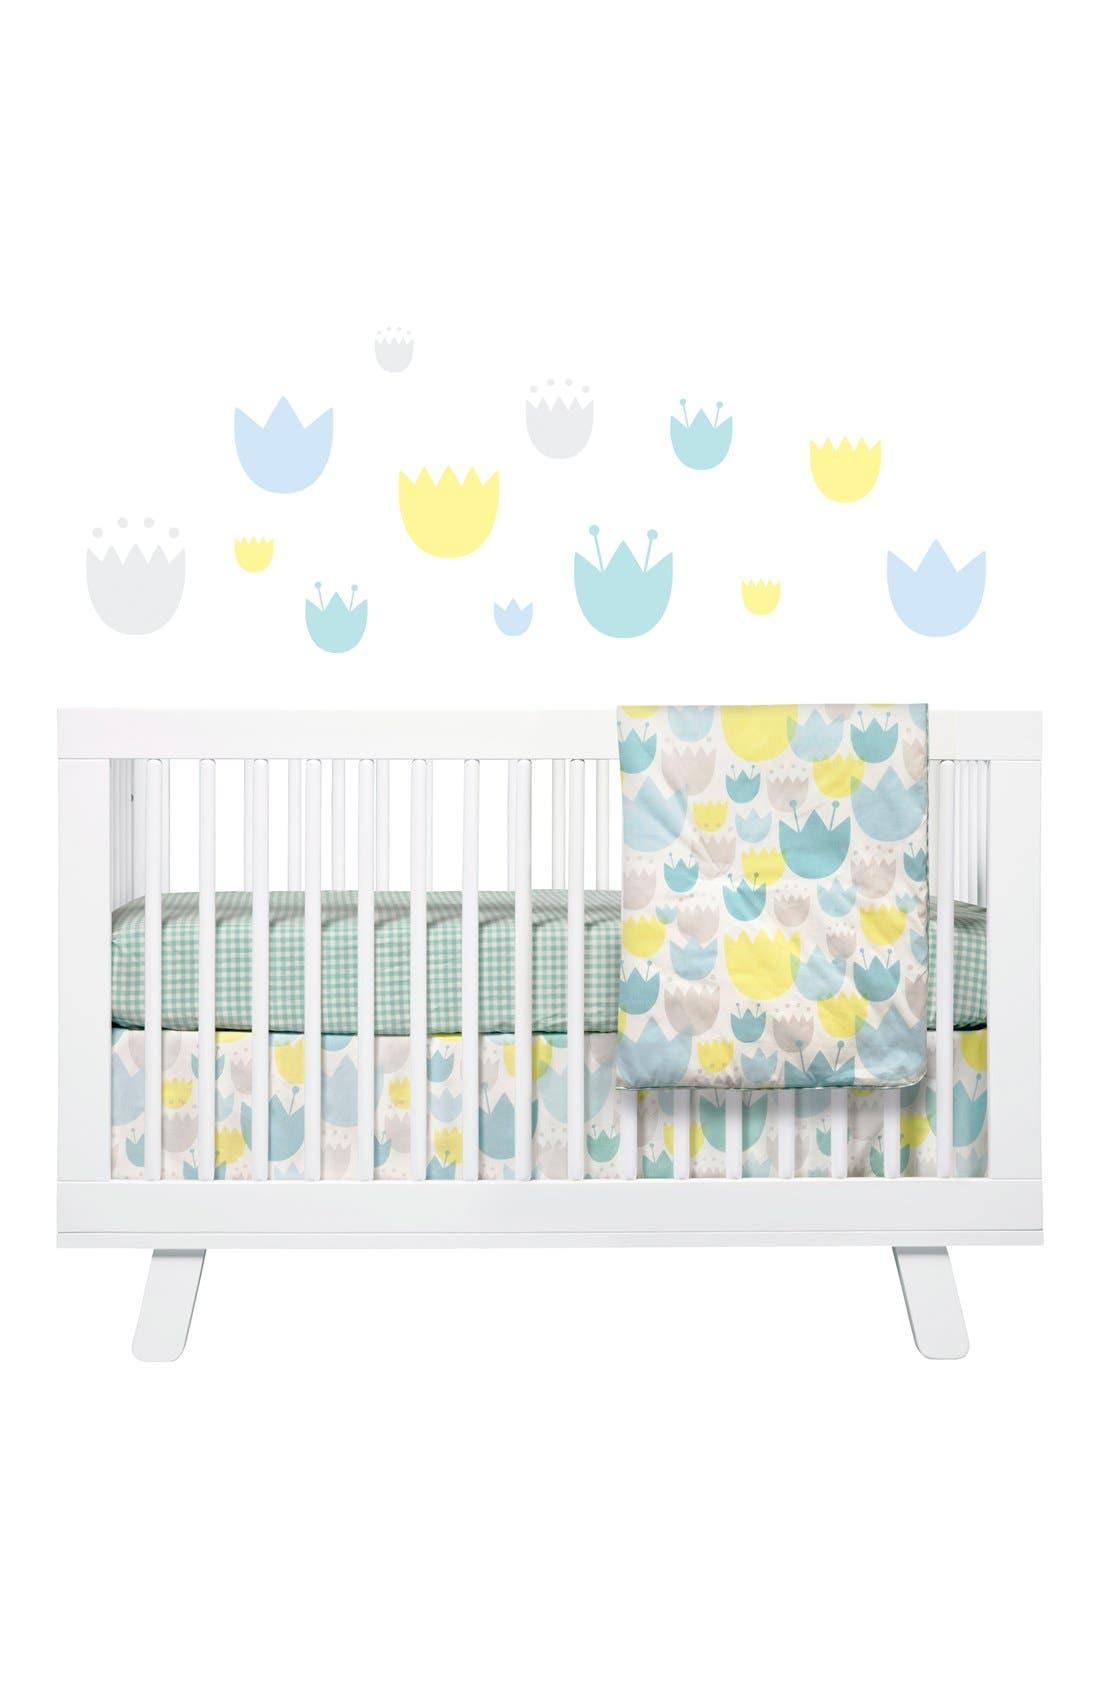 BABYLETTO 'Garden' Crib Sheet, Crib Skirt, Play Blanket,